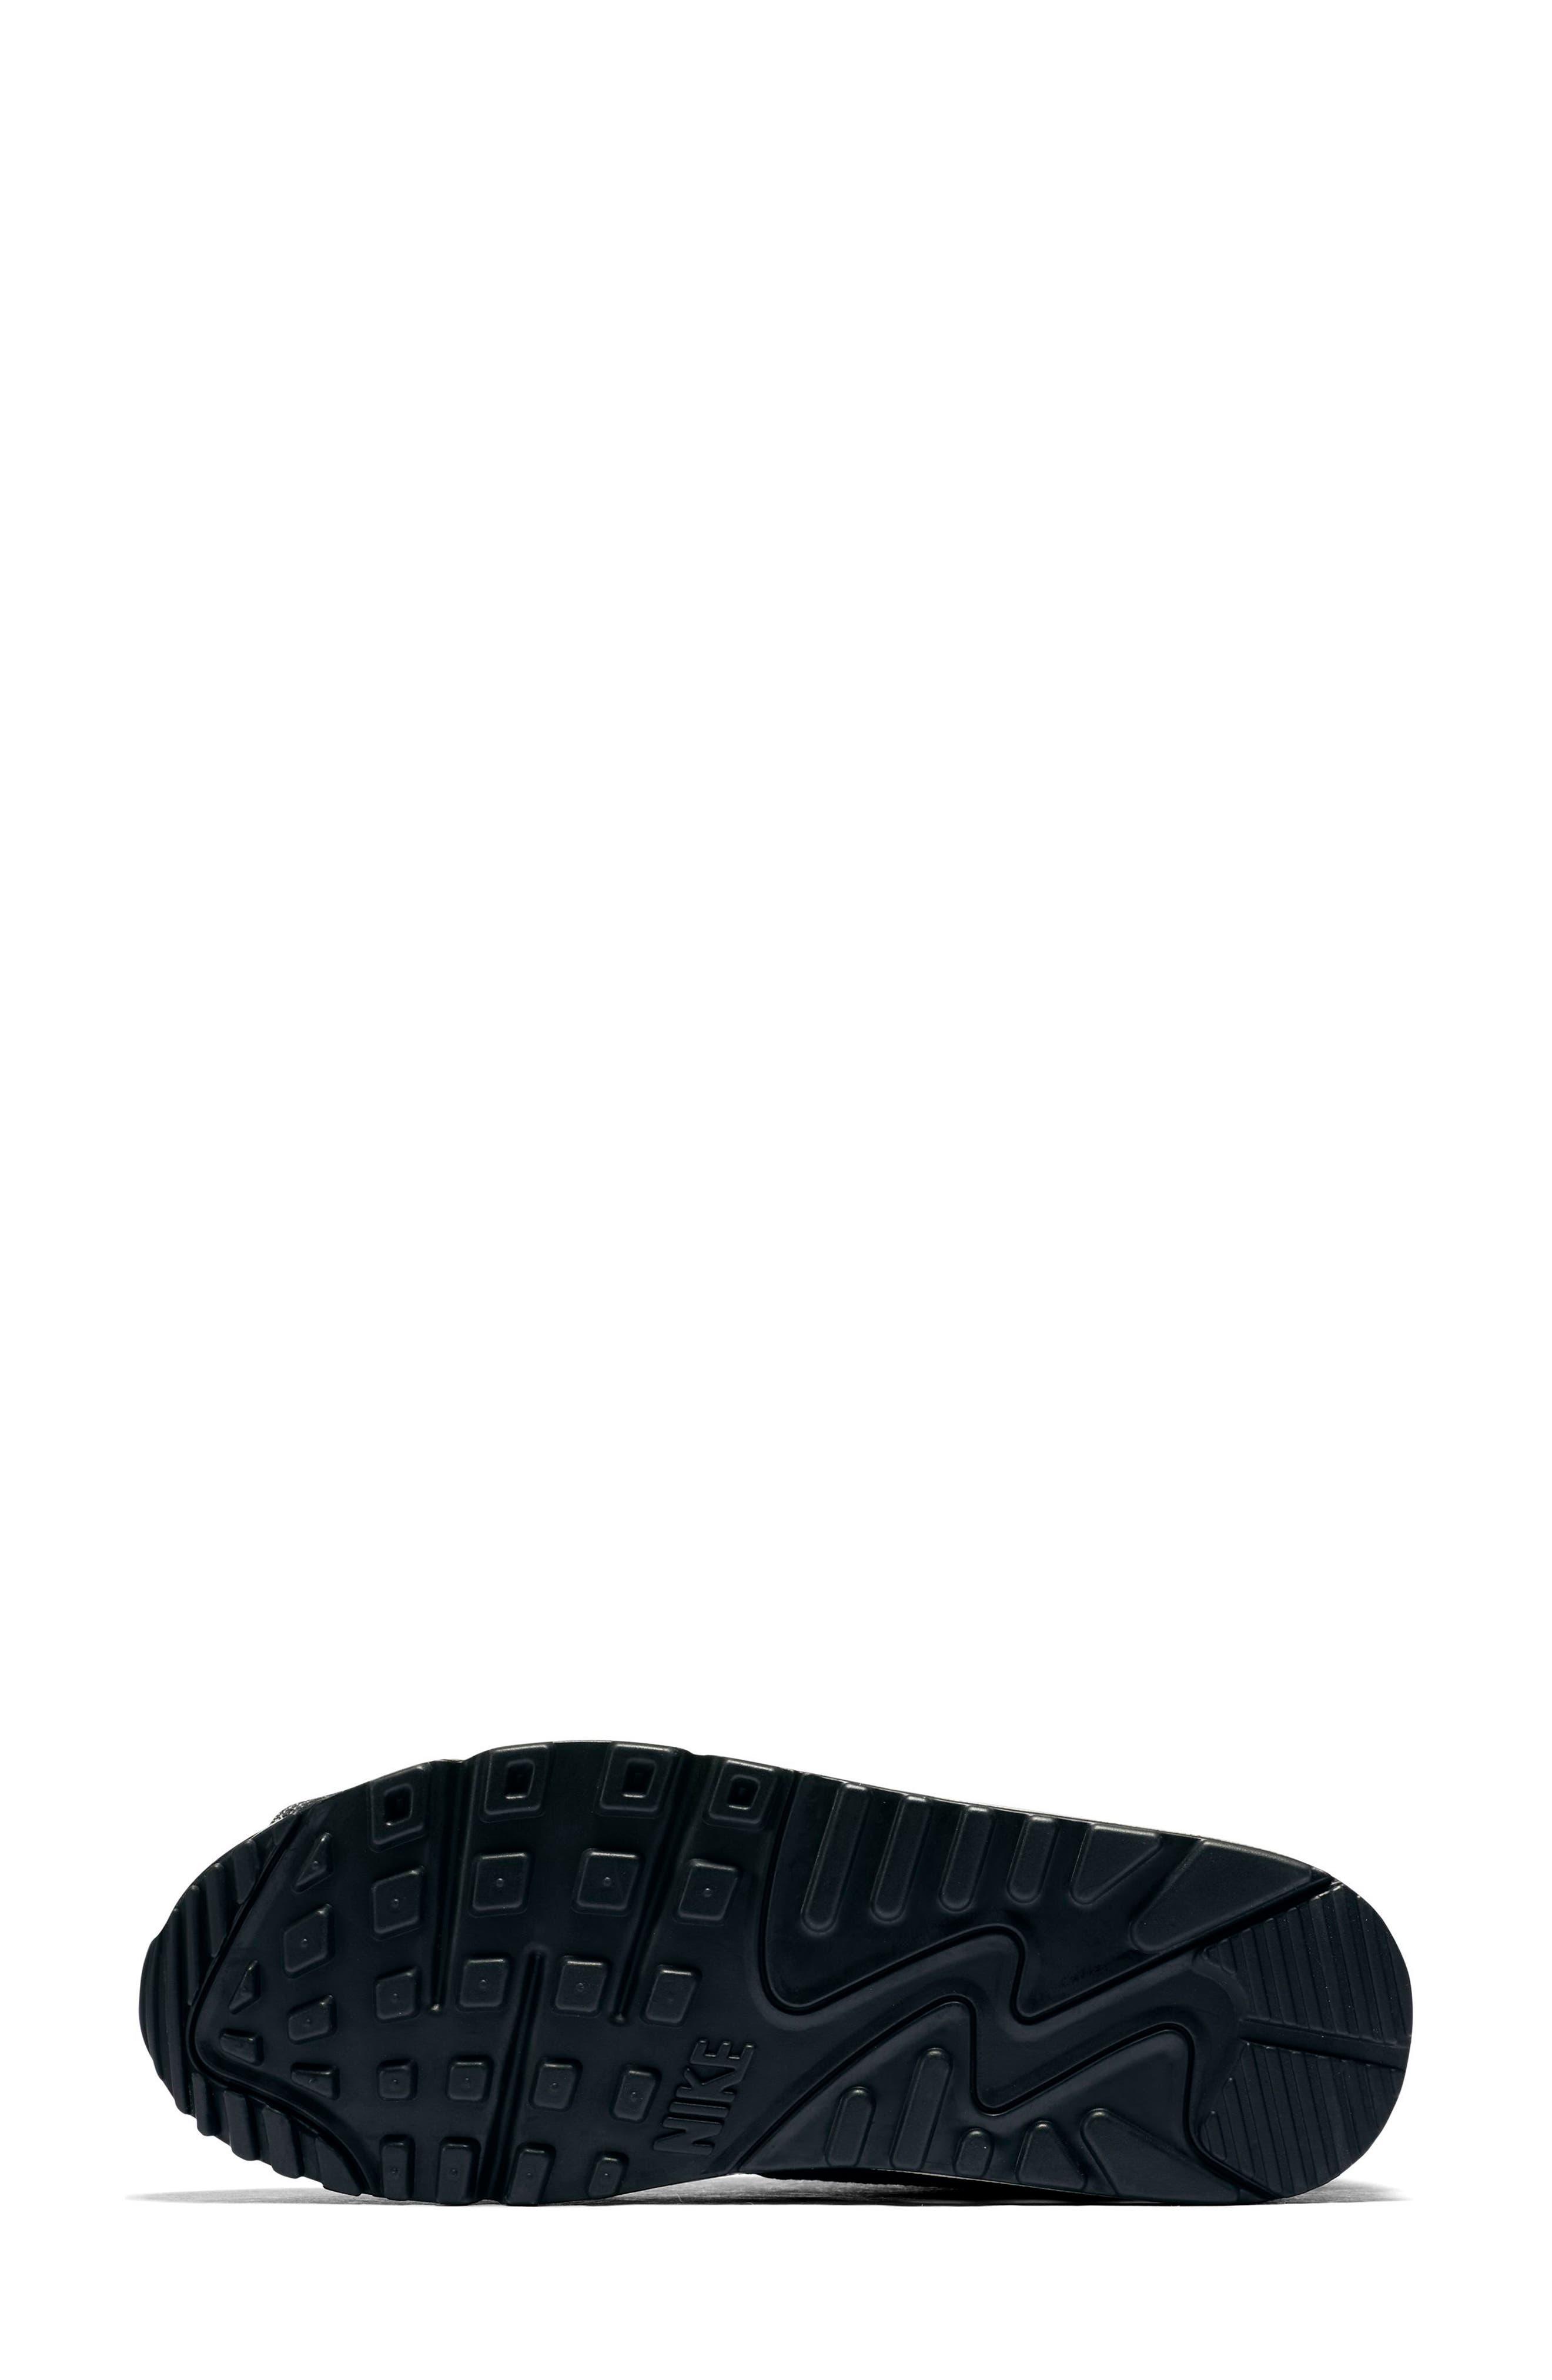 Air Max 90 SE Sneaker,                             Alternate thumbnail 49, color,